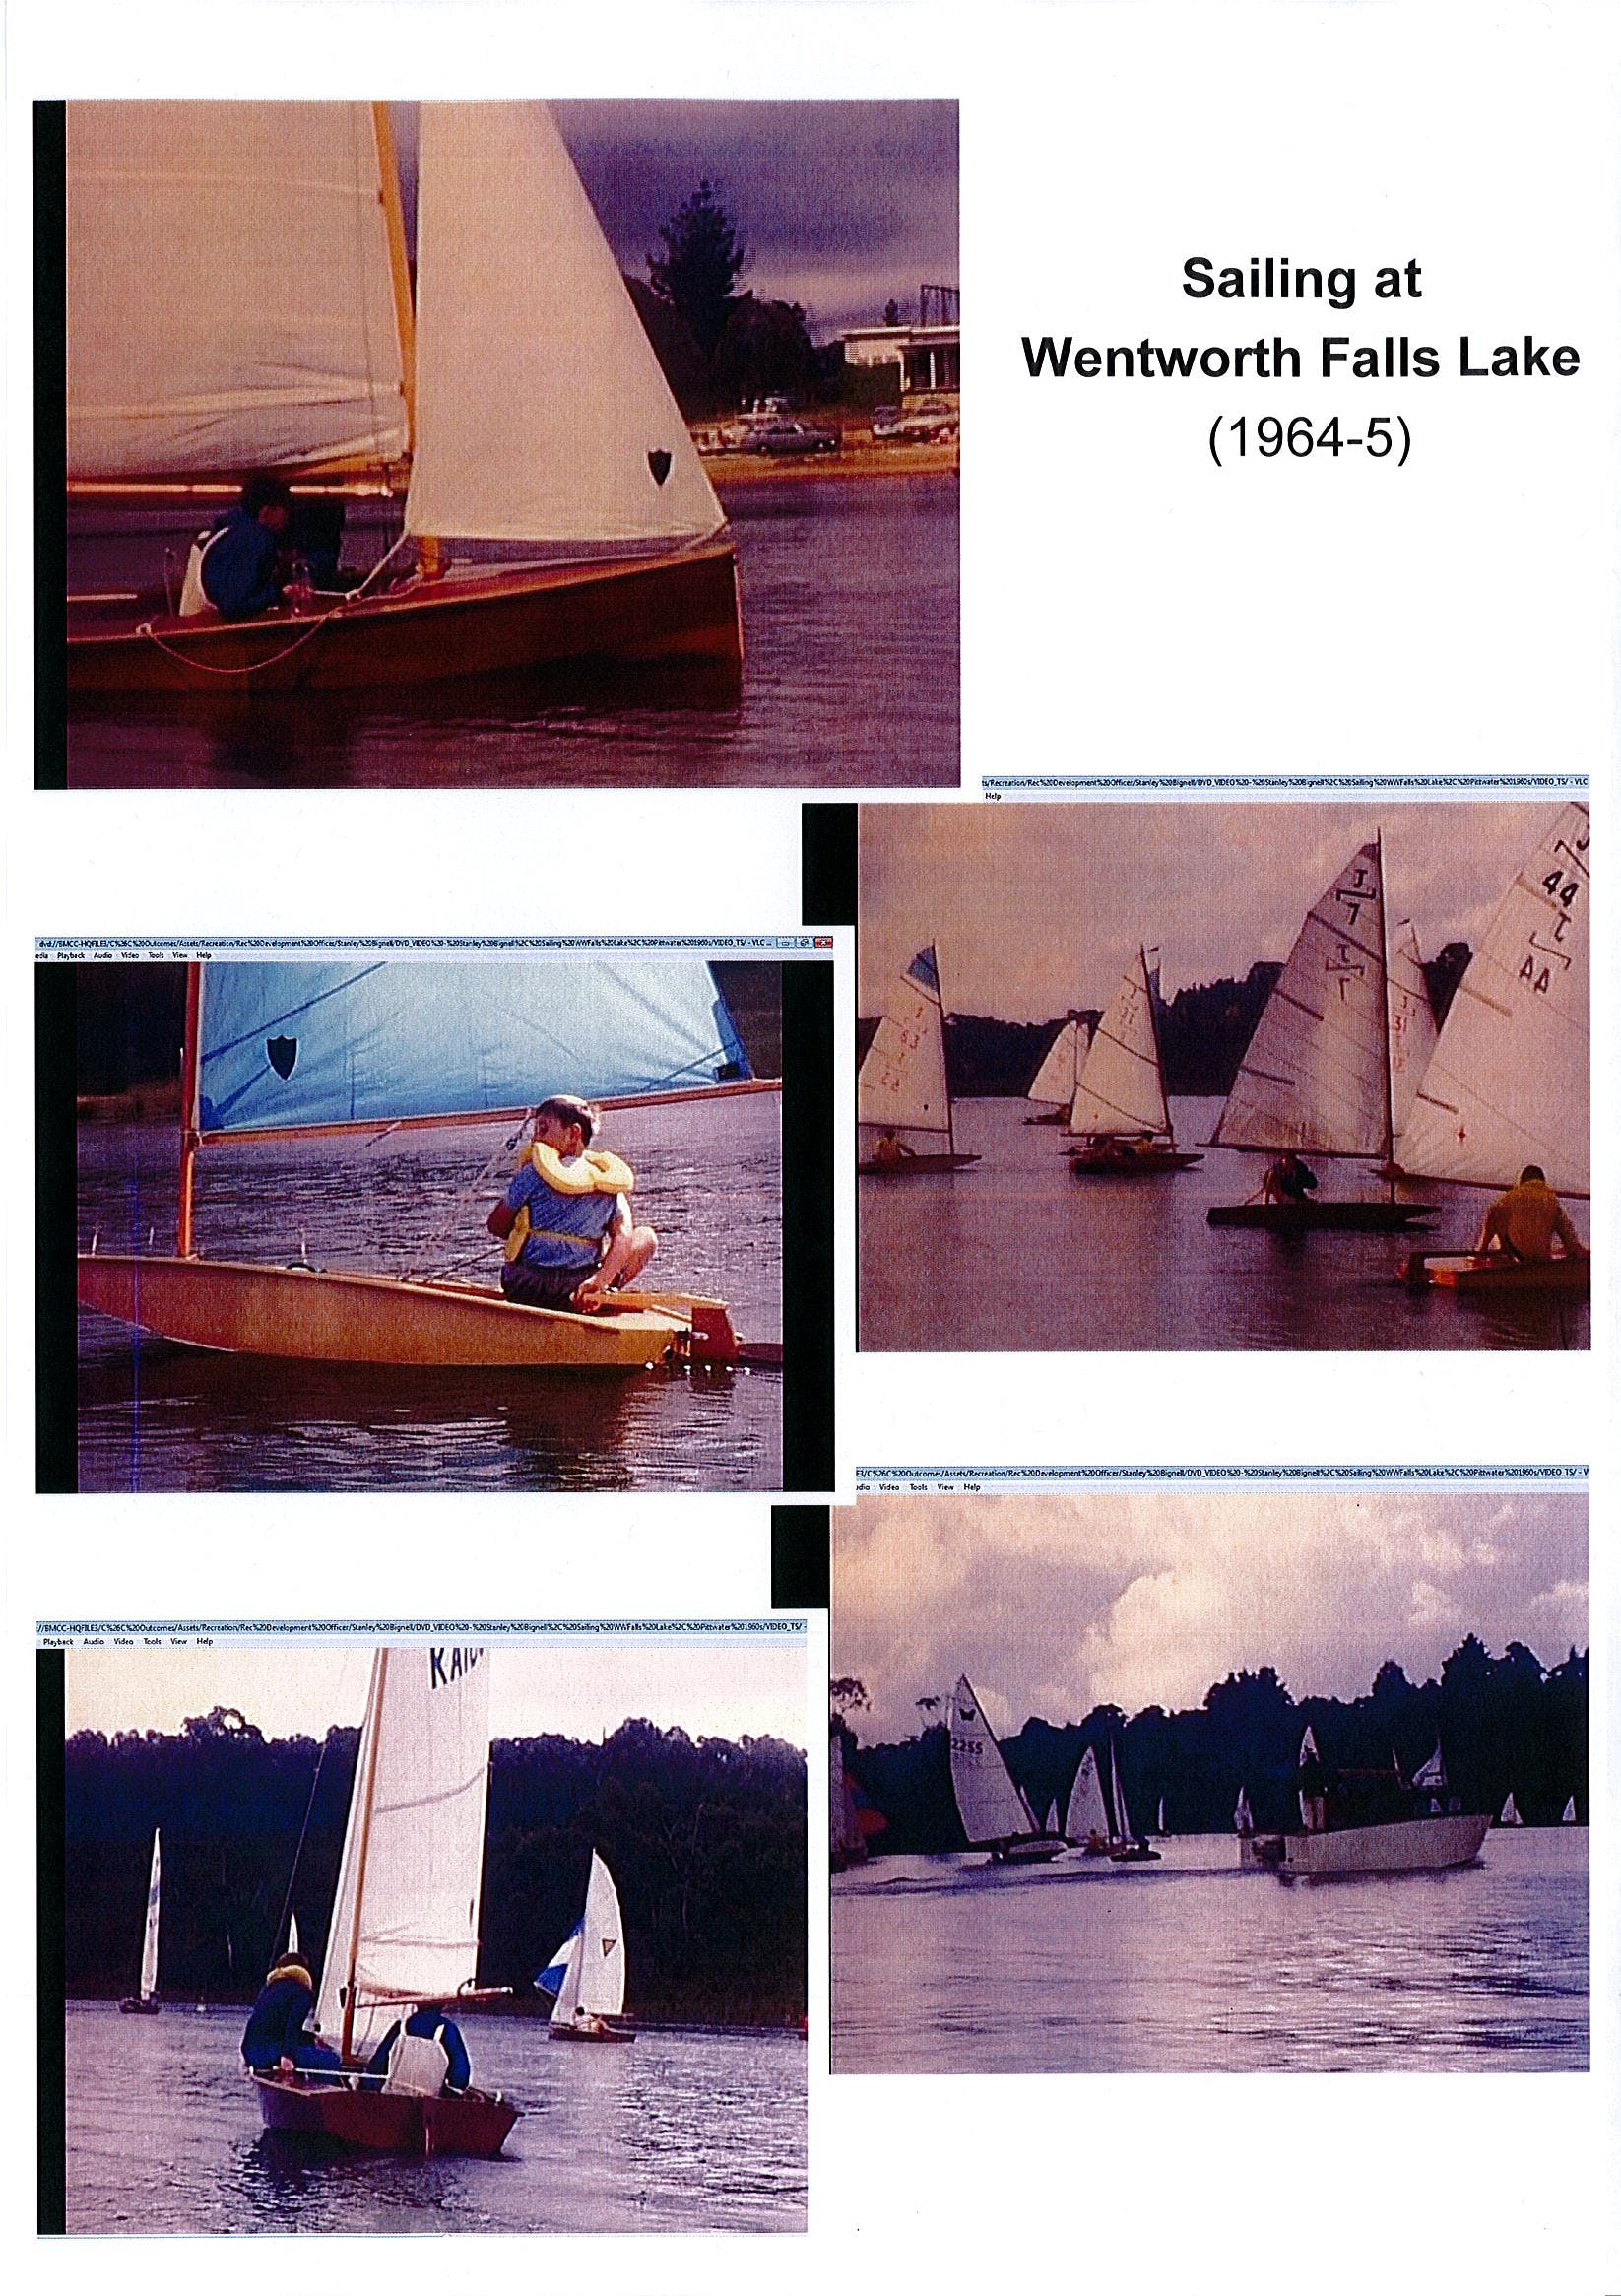 Sailing Pics Ww Falls Lake Stanley Bignell 2